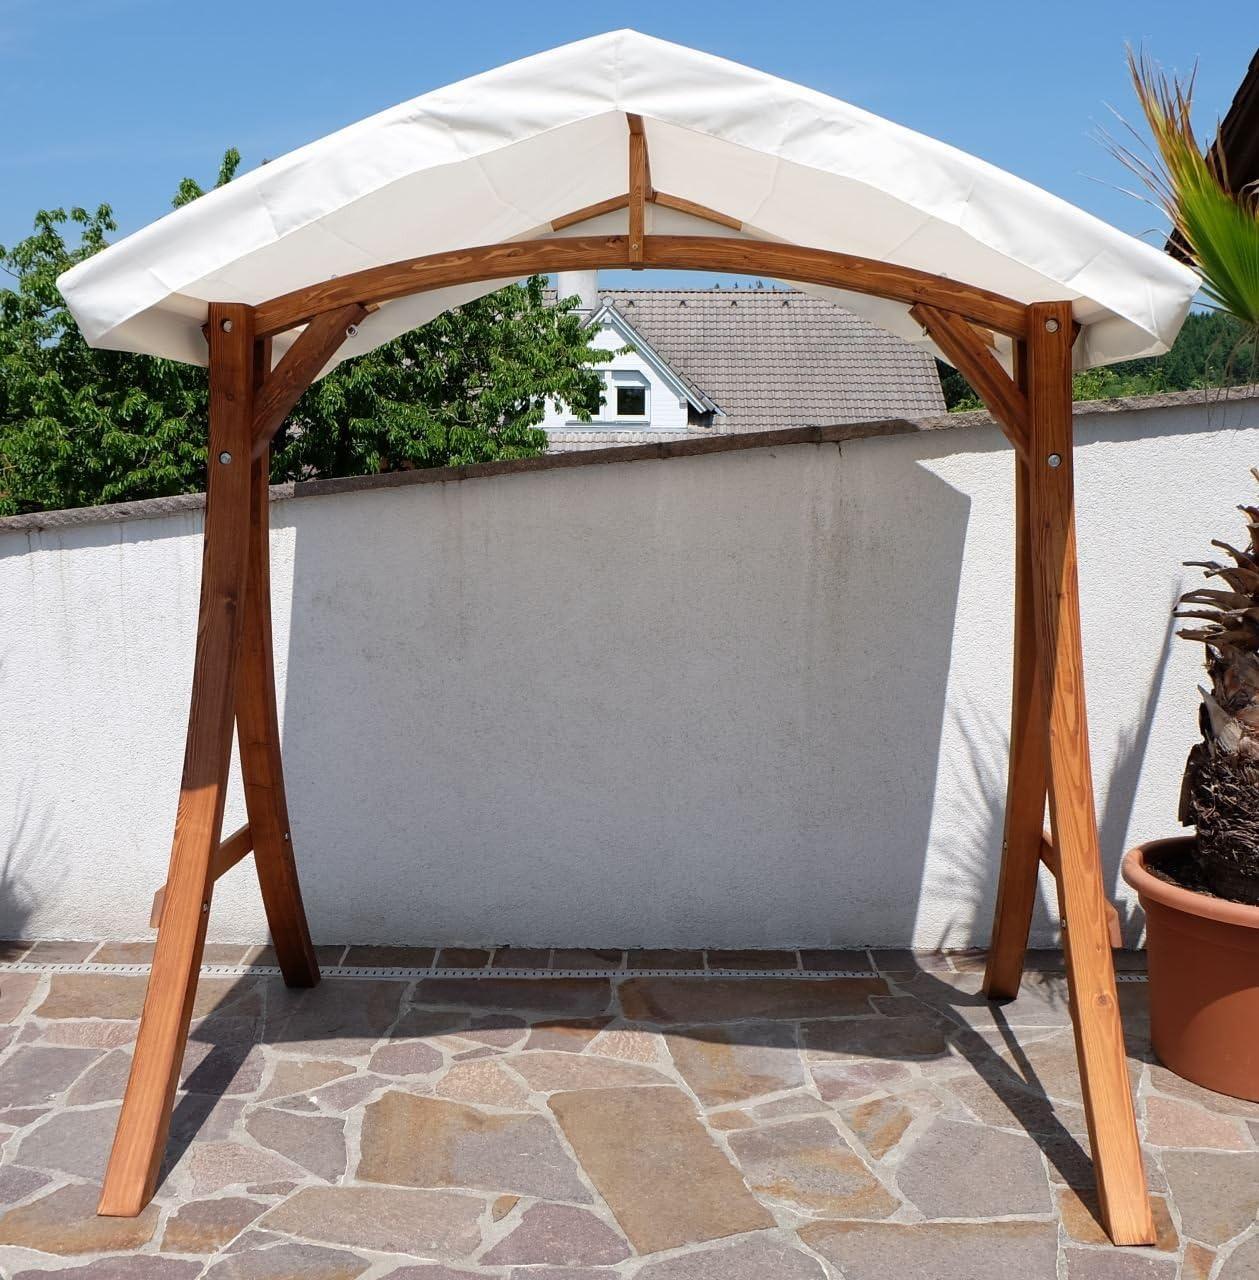 Design Hollywoodschaukel Gestell KUREDO/ARUBA aus Holz Lärche ...